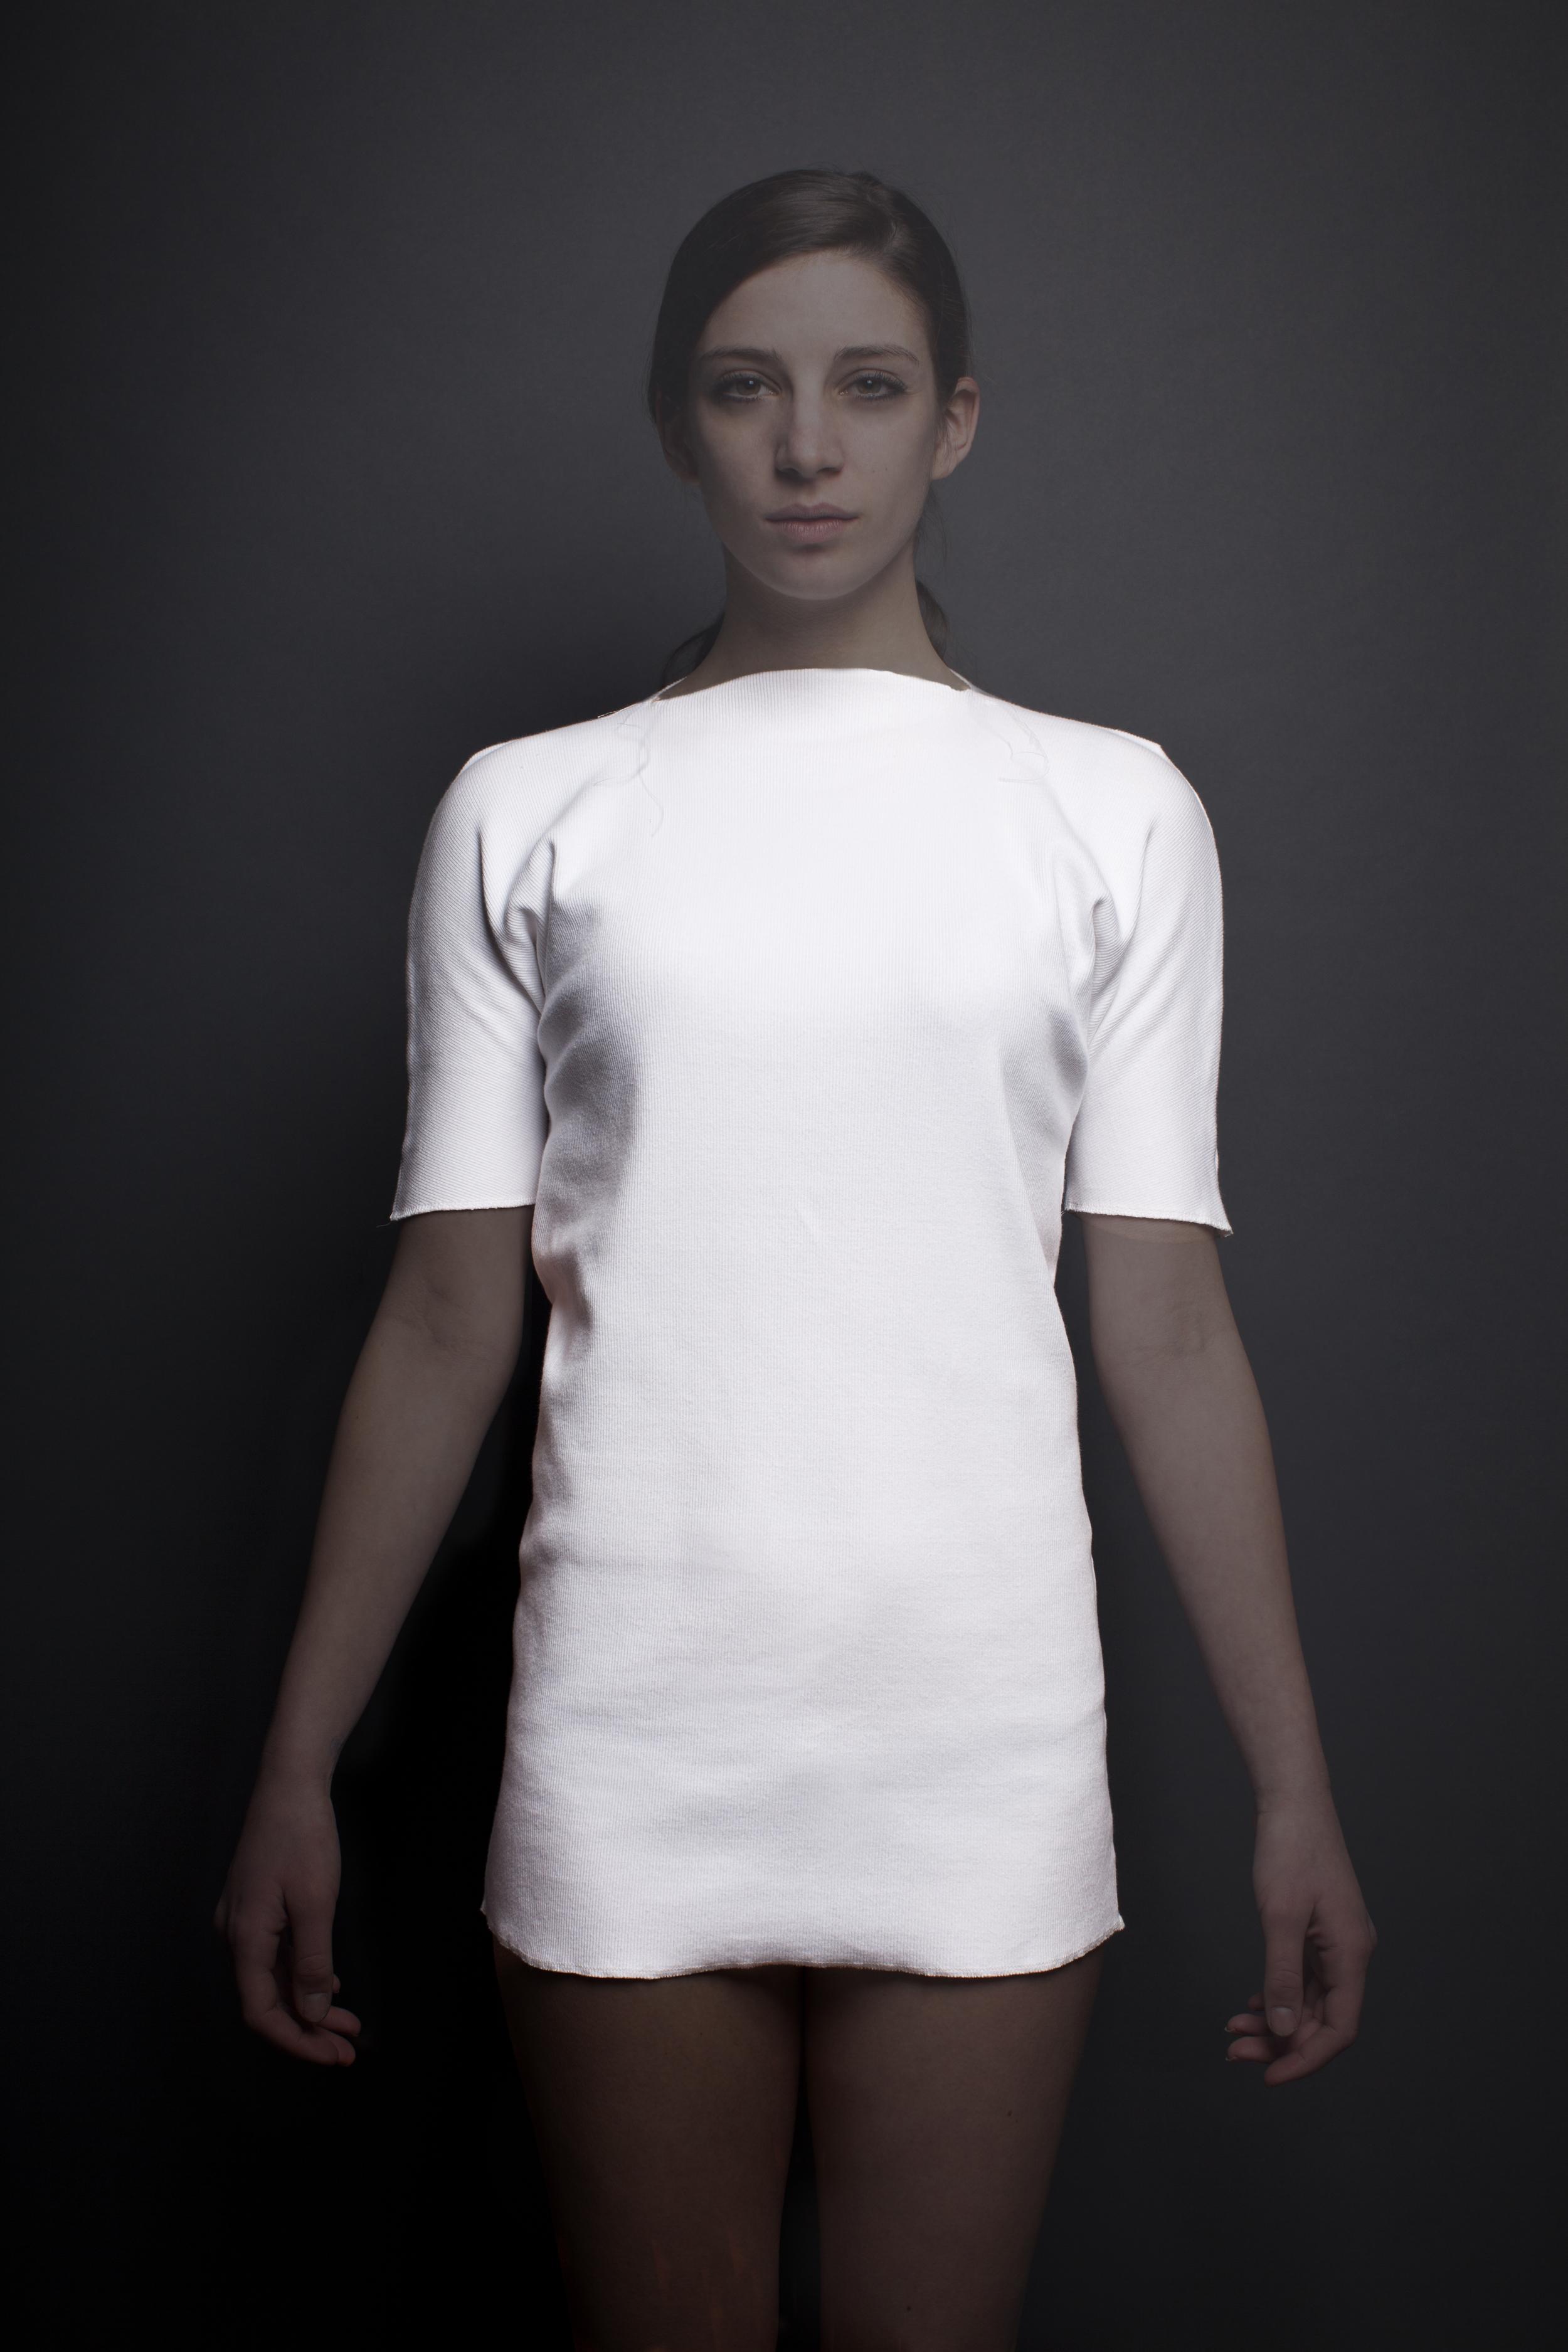 Haman_GhostShirt-Girl_v2-HR.jpg